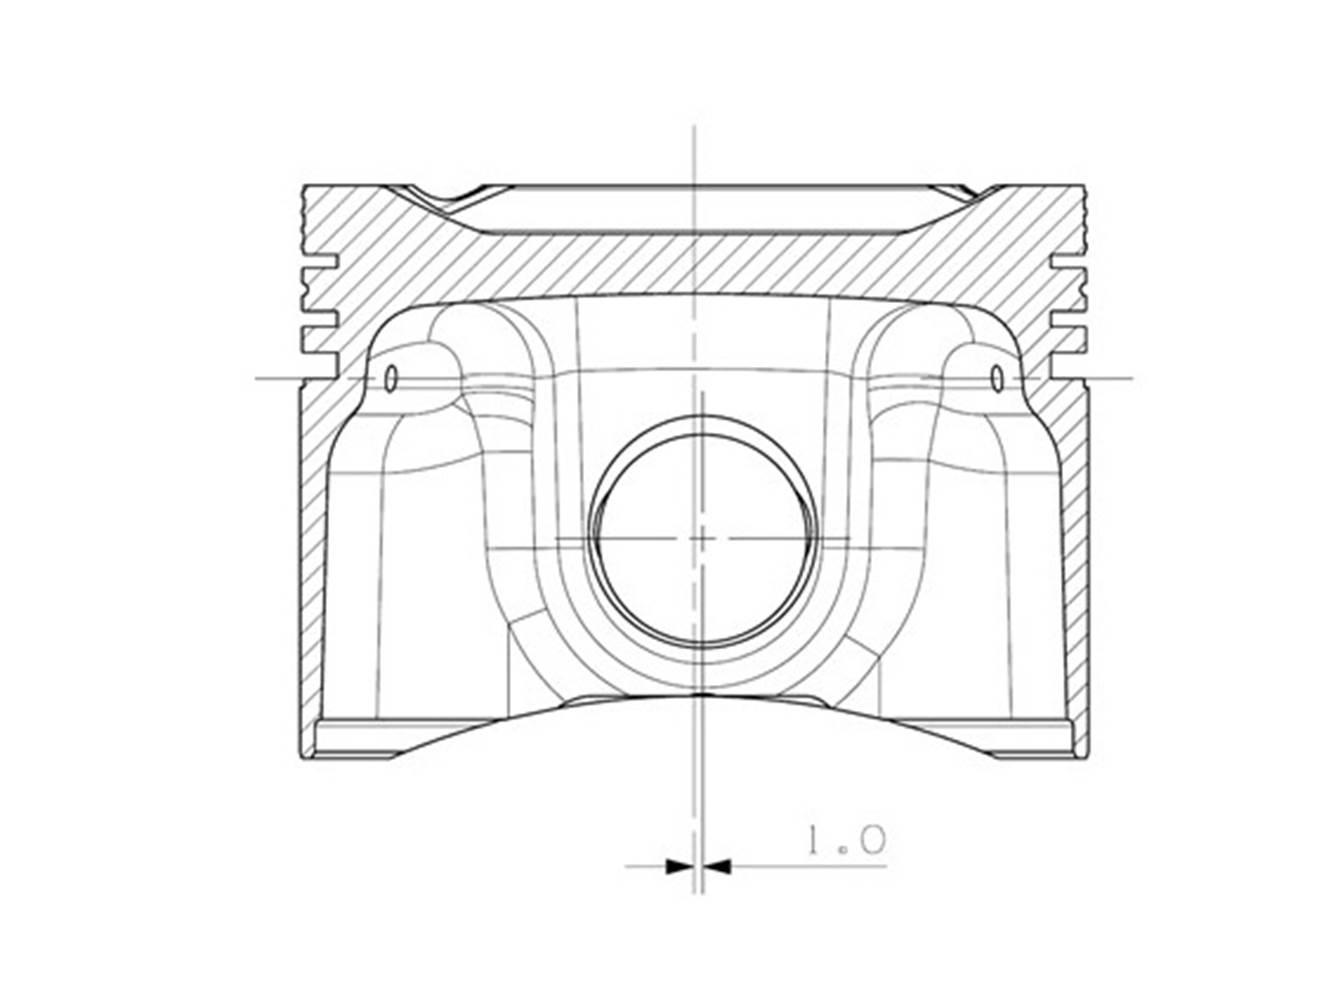 Cosworth YB Piston Drawing